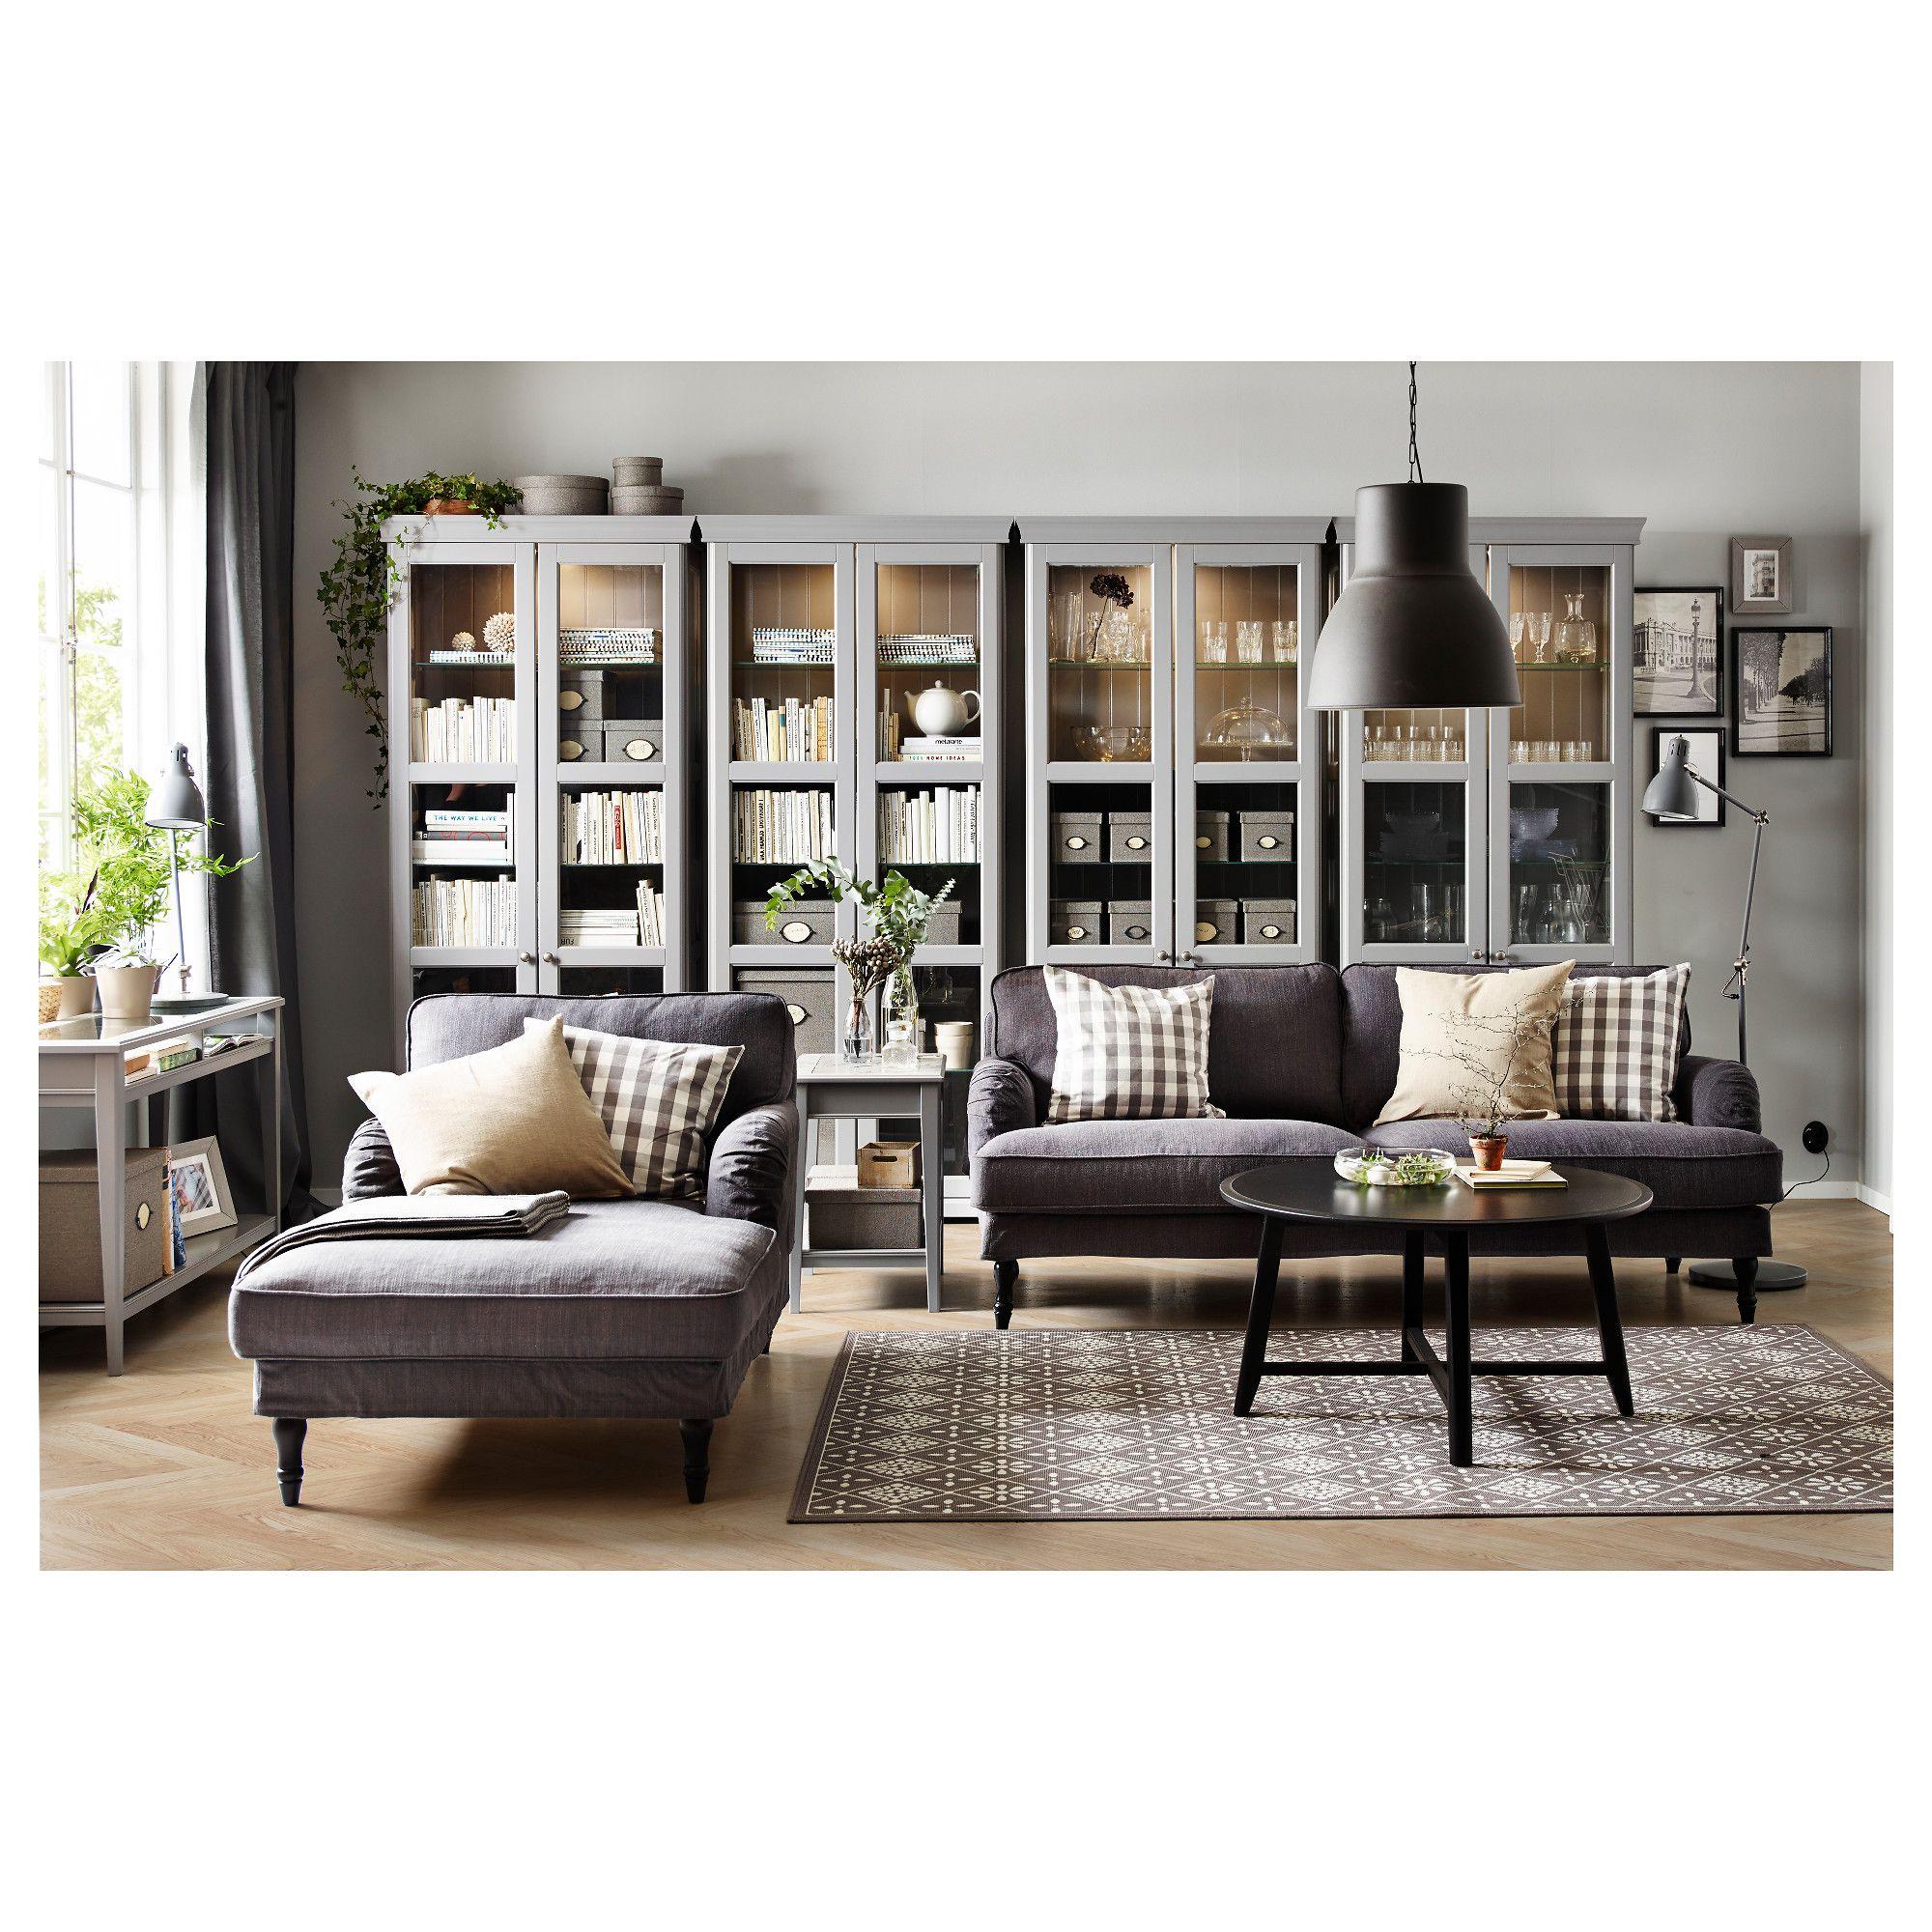 Soggiorno Ikea Liatorp | Ikea Armadi A Muro Fresco Ikea Besta Google ...